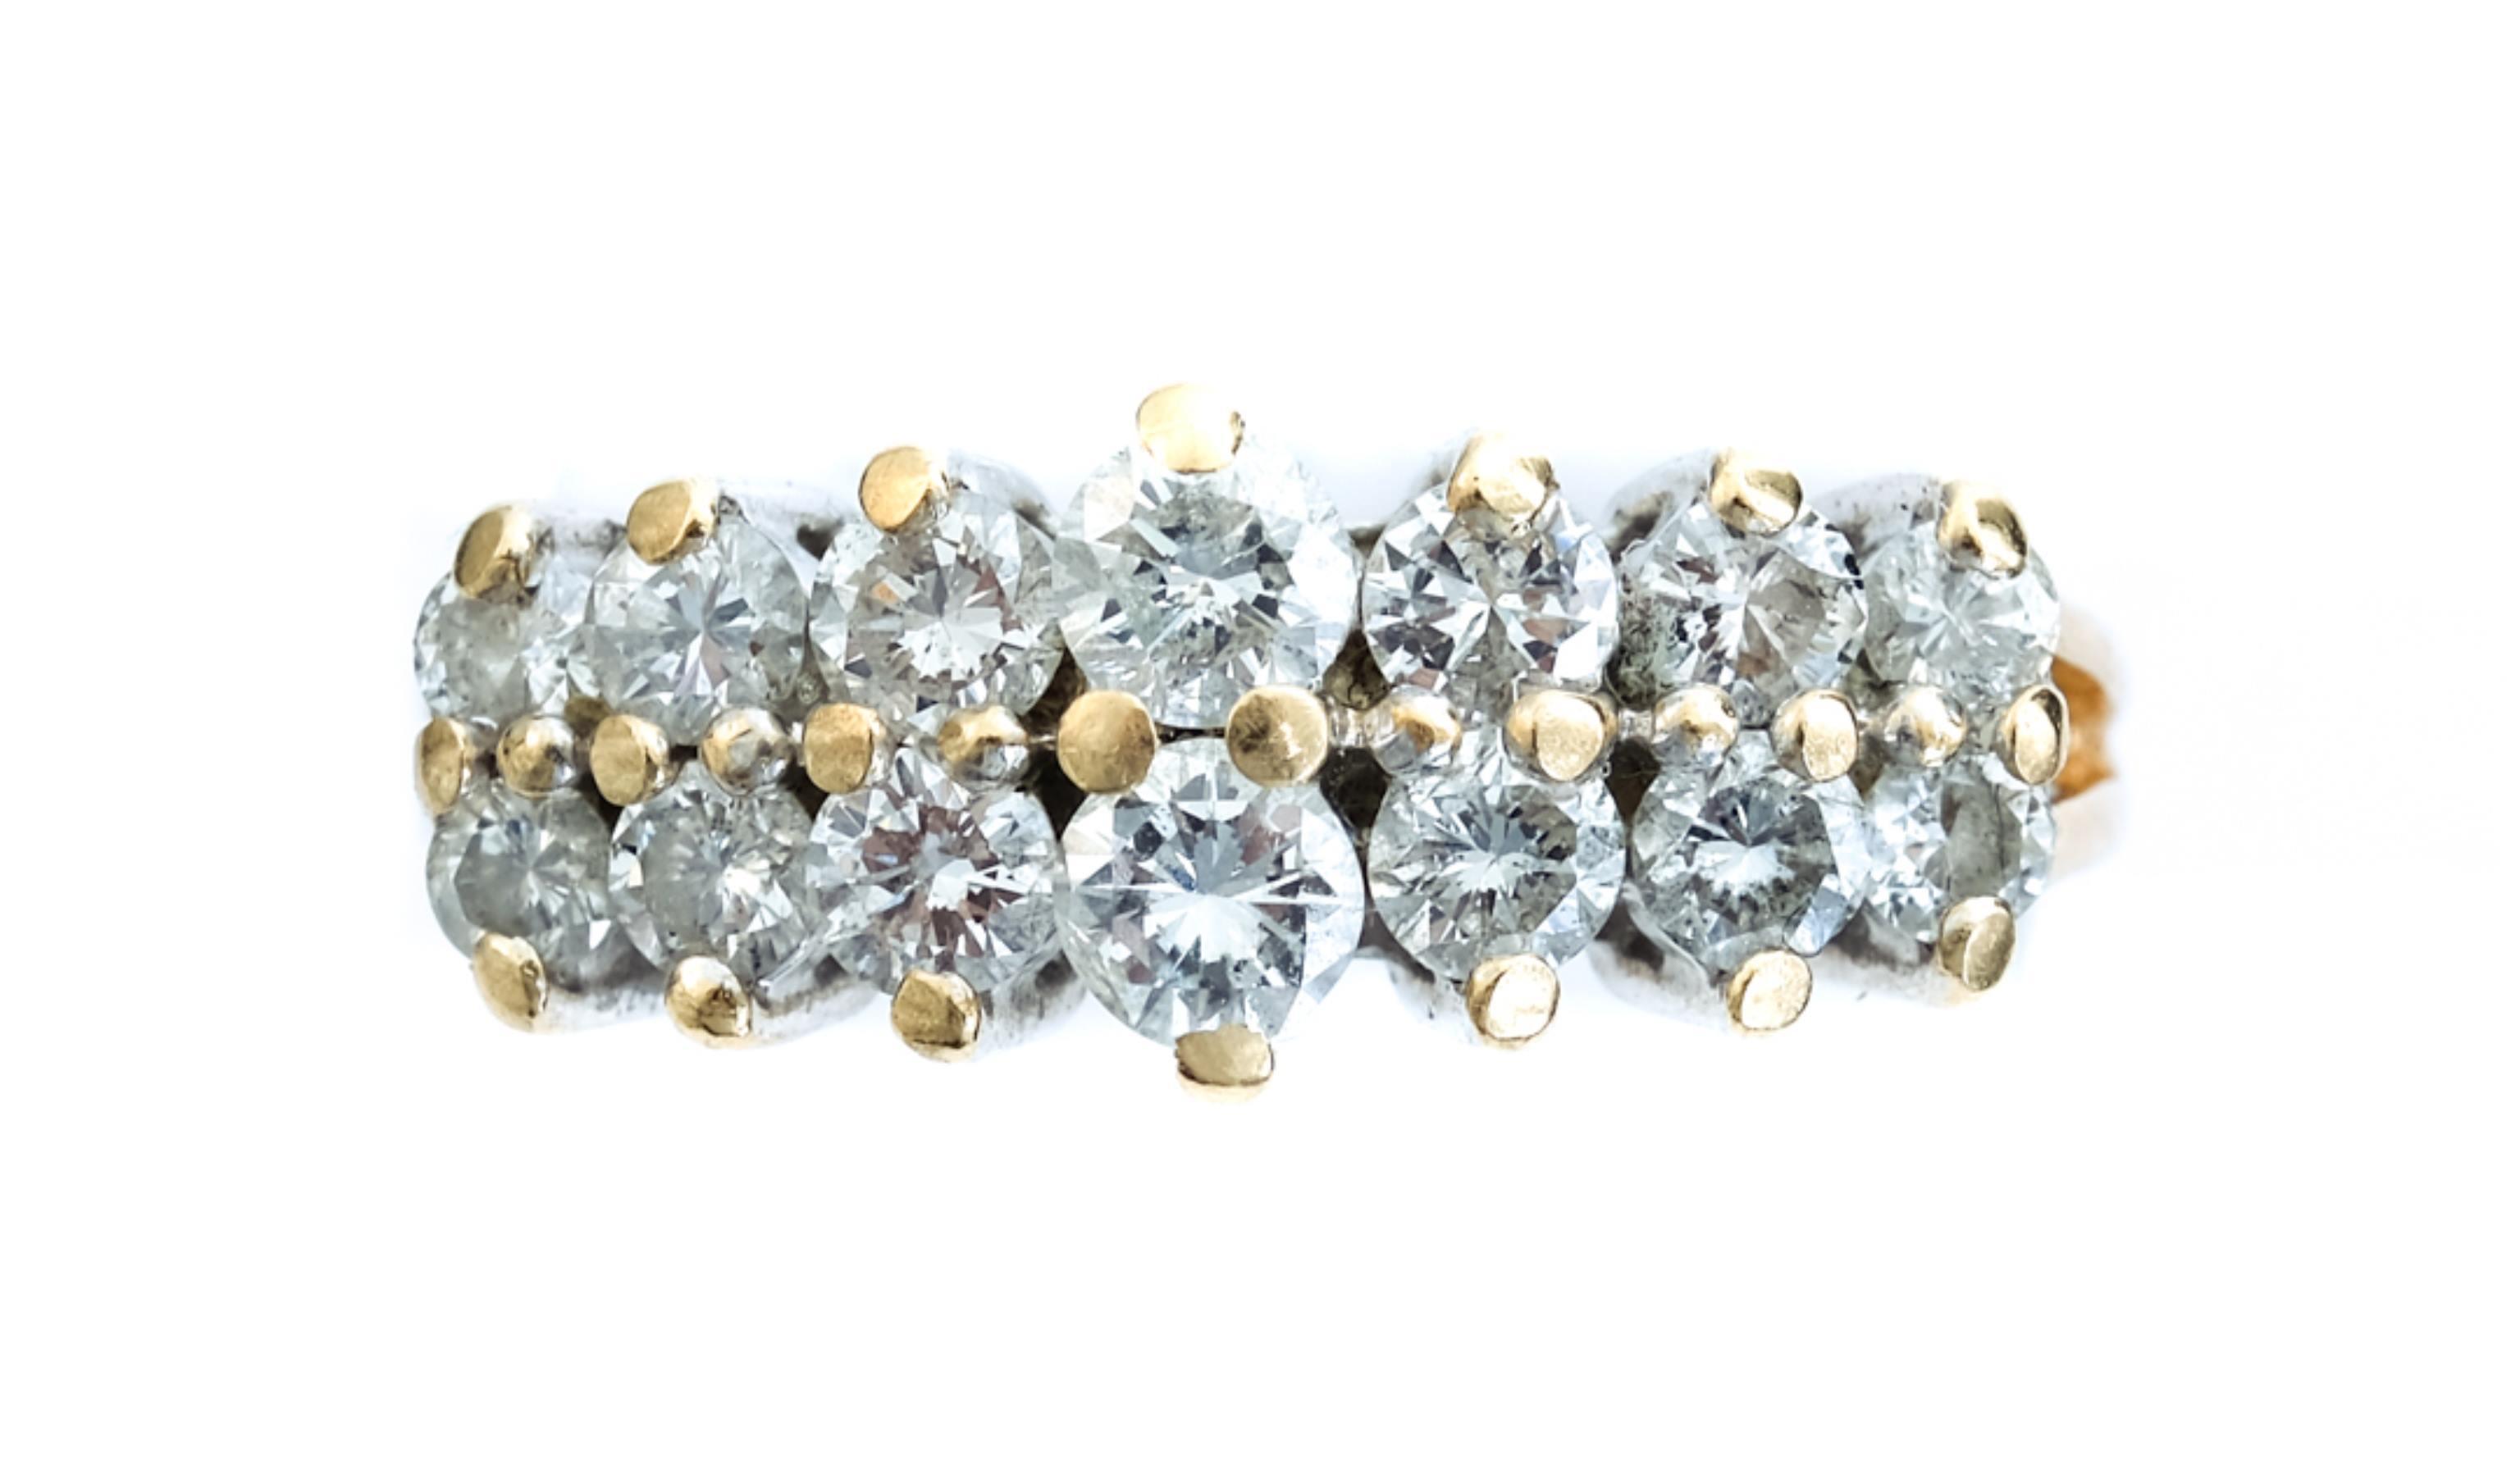 14k Yellow Gold Ring w/14 Diamonds, Size 6 1/2